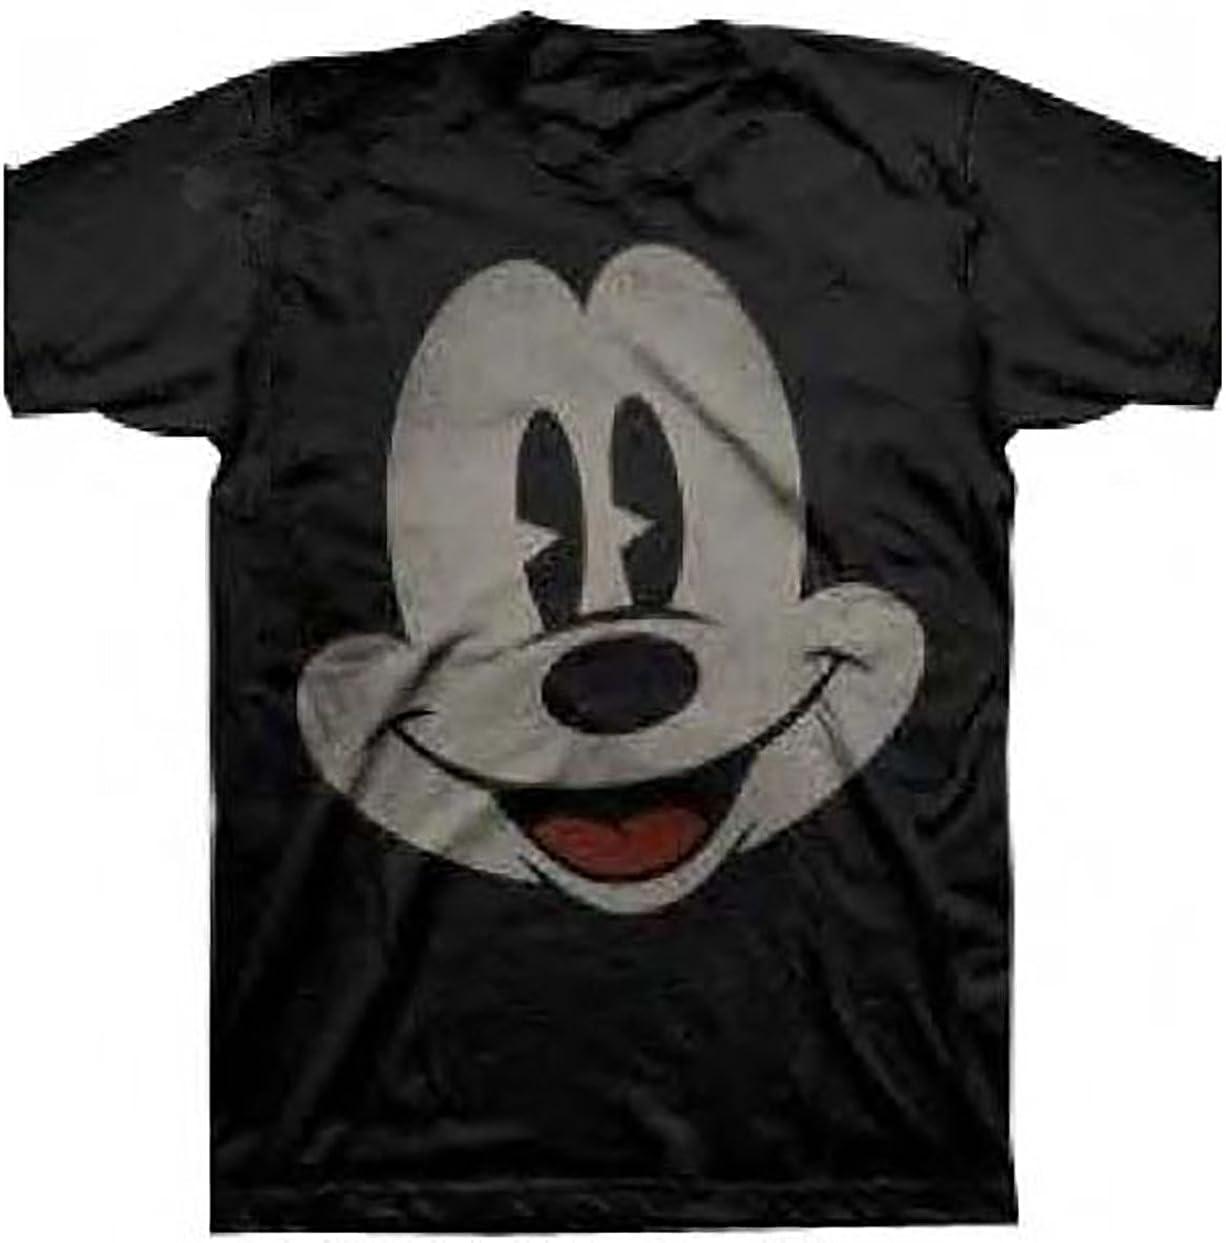 Disney Mickey Mouse Smile Face Boys Fashion Top T shirt